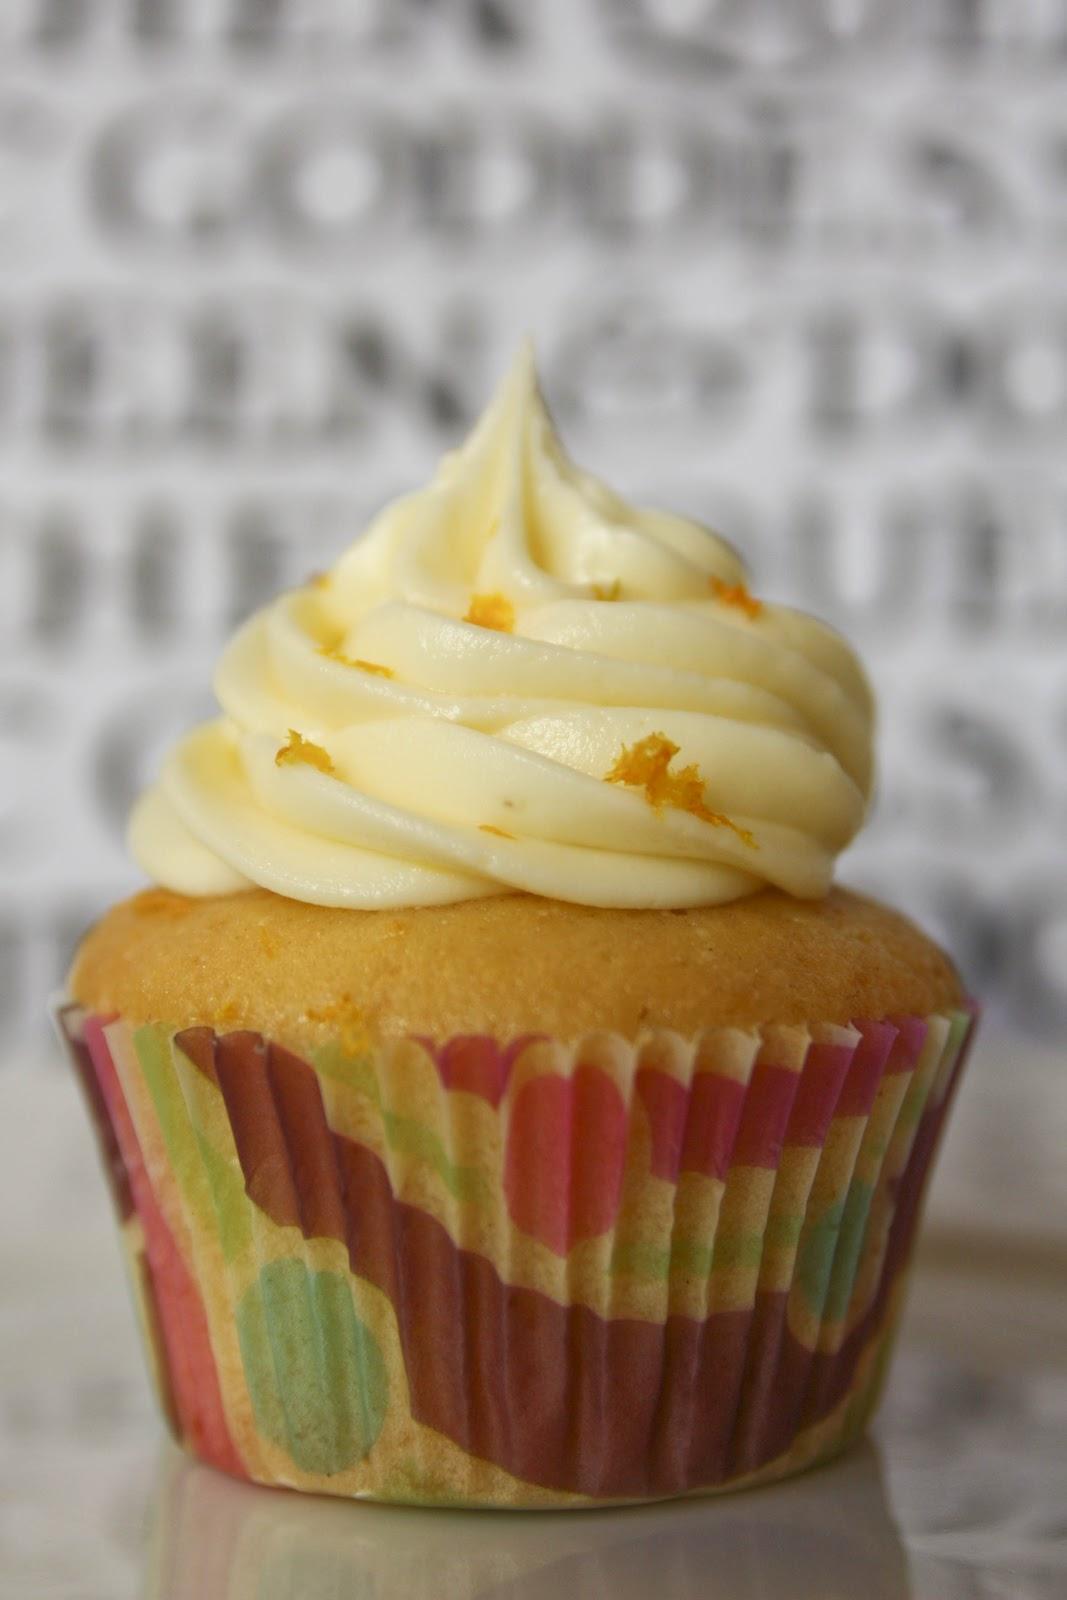 orange cupcakes, orange and orange blossom buttercream swirl, cake